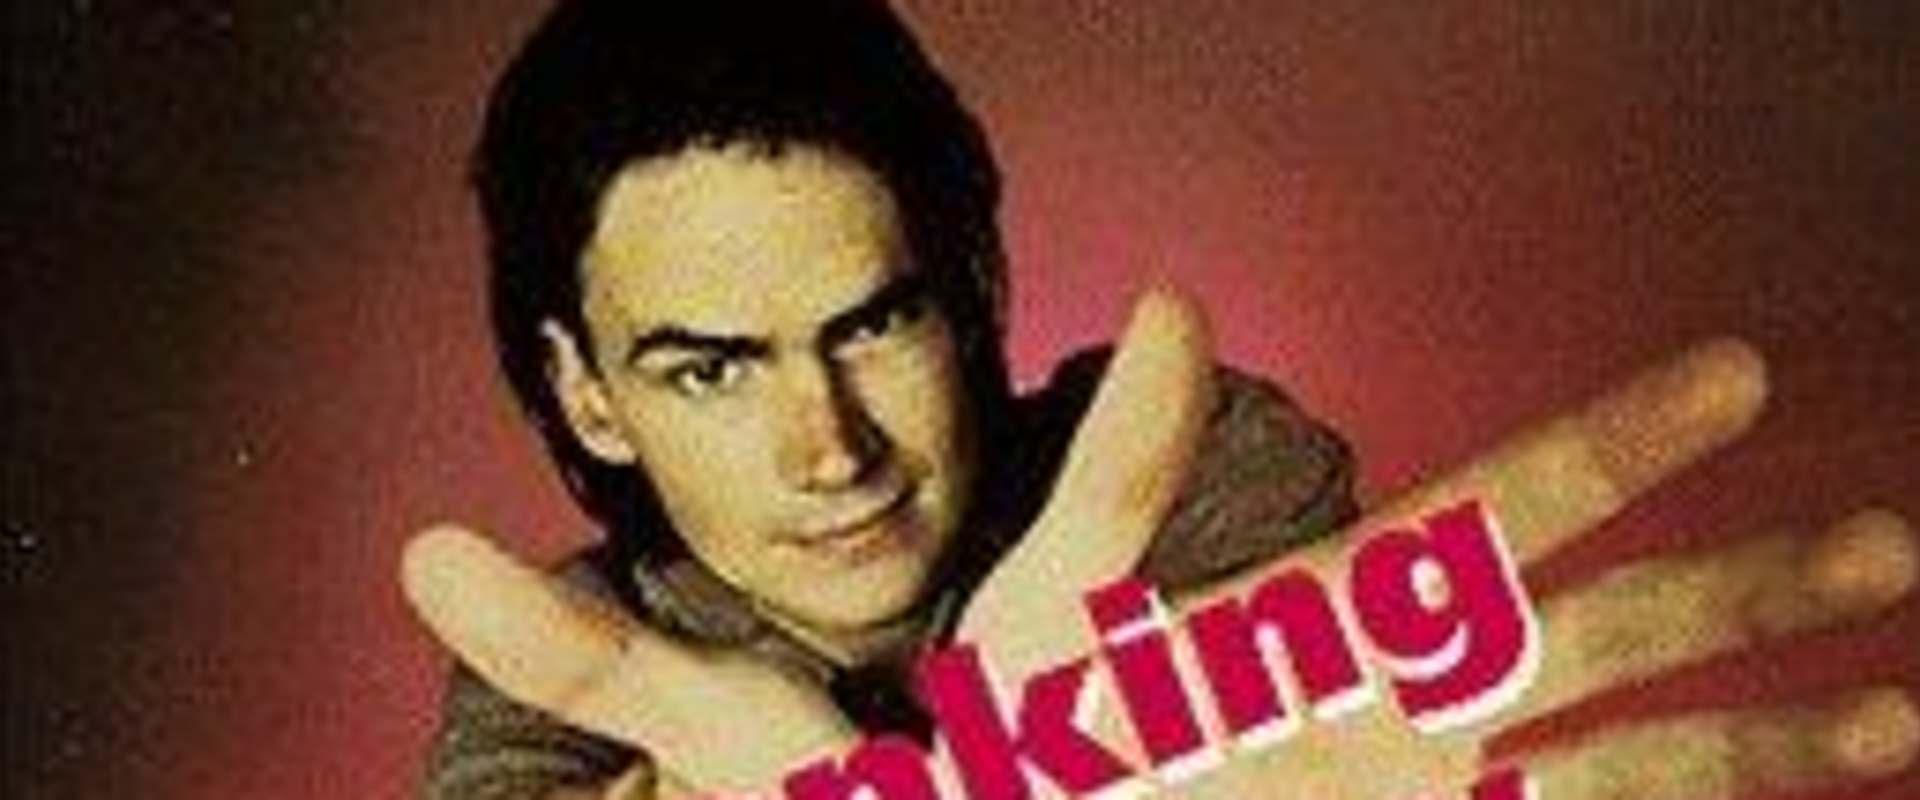 Movie spank the monkey uncut